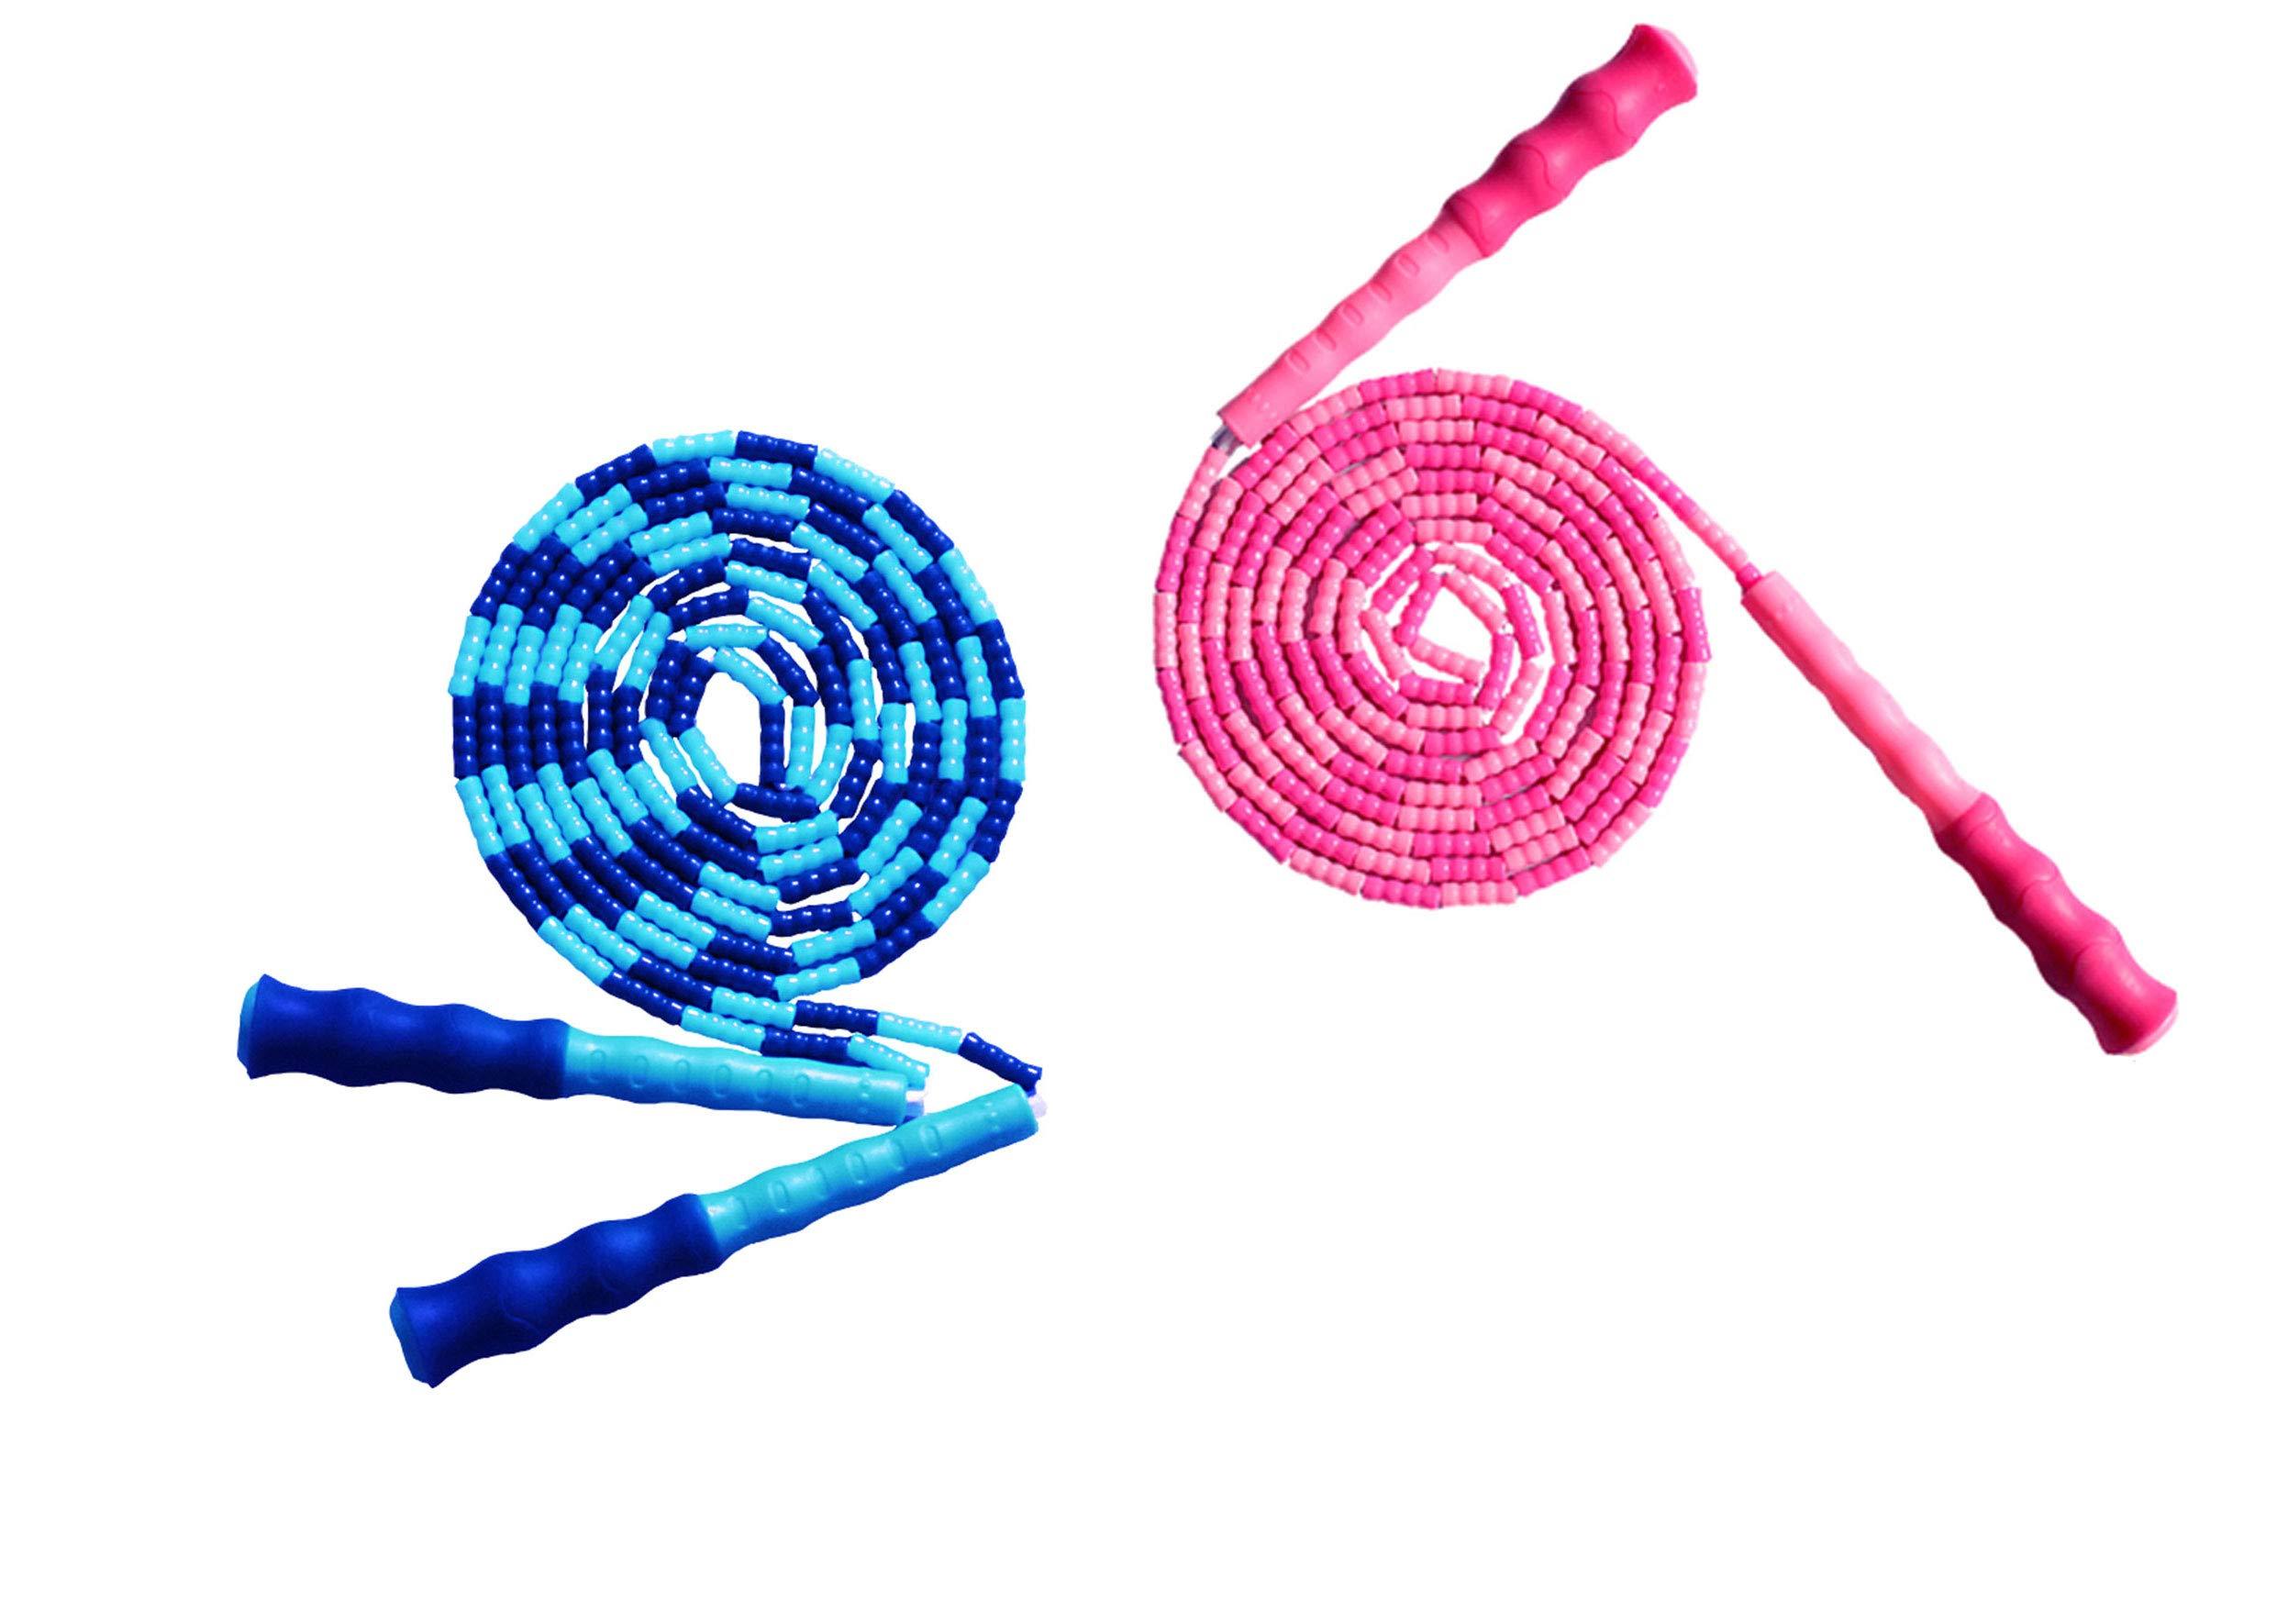 LETUSPORT 9 Feet Adjustable Beaded Segmented Jump Rope for Women Men Kids Lightweight Work Out Speeding Jumping Ropes (Blue+Pink, 2 pcs)